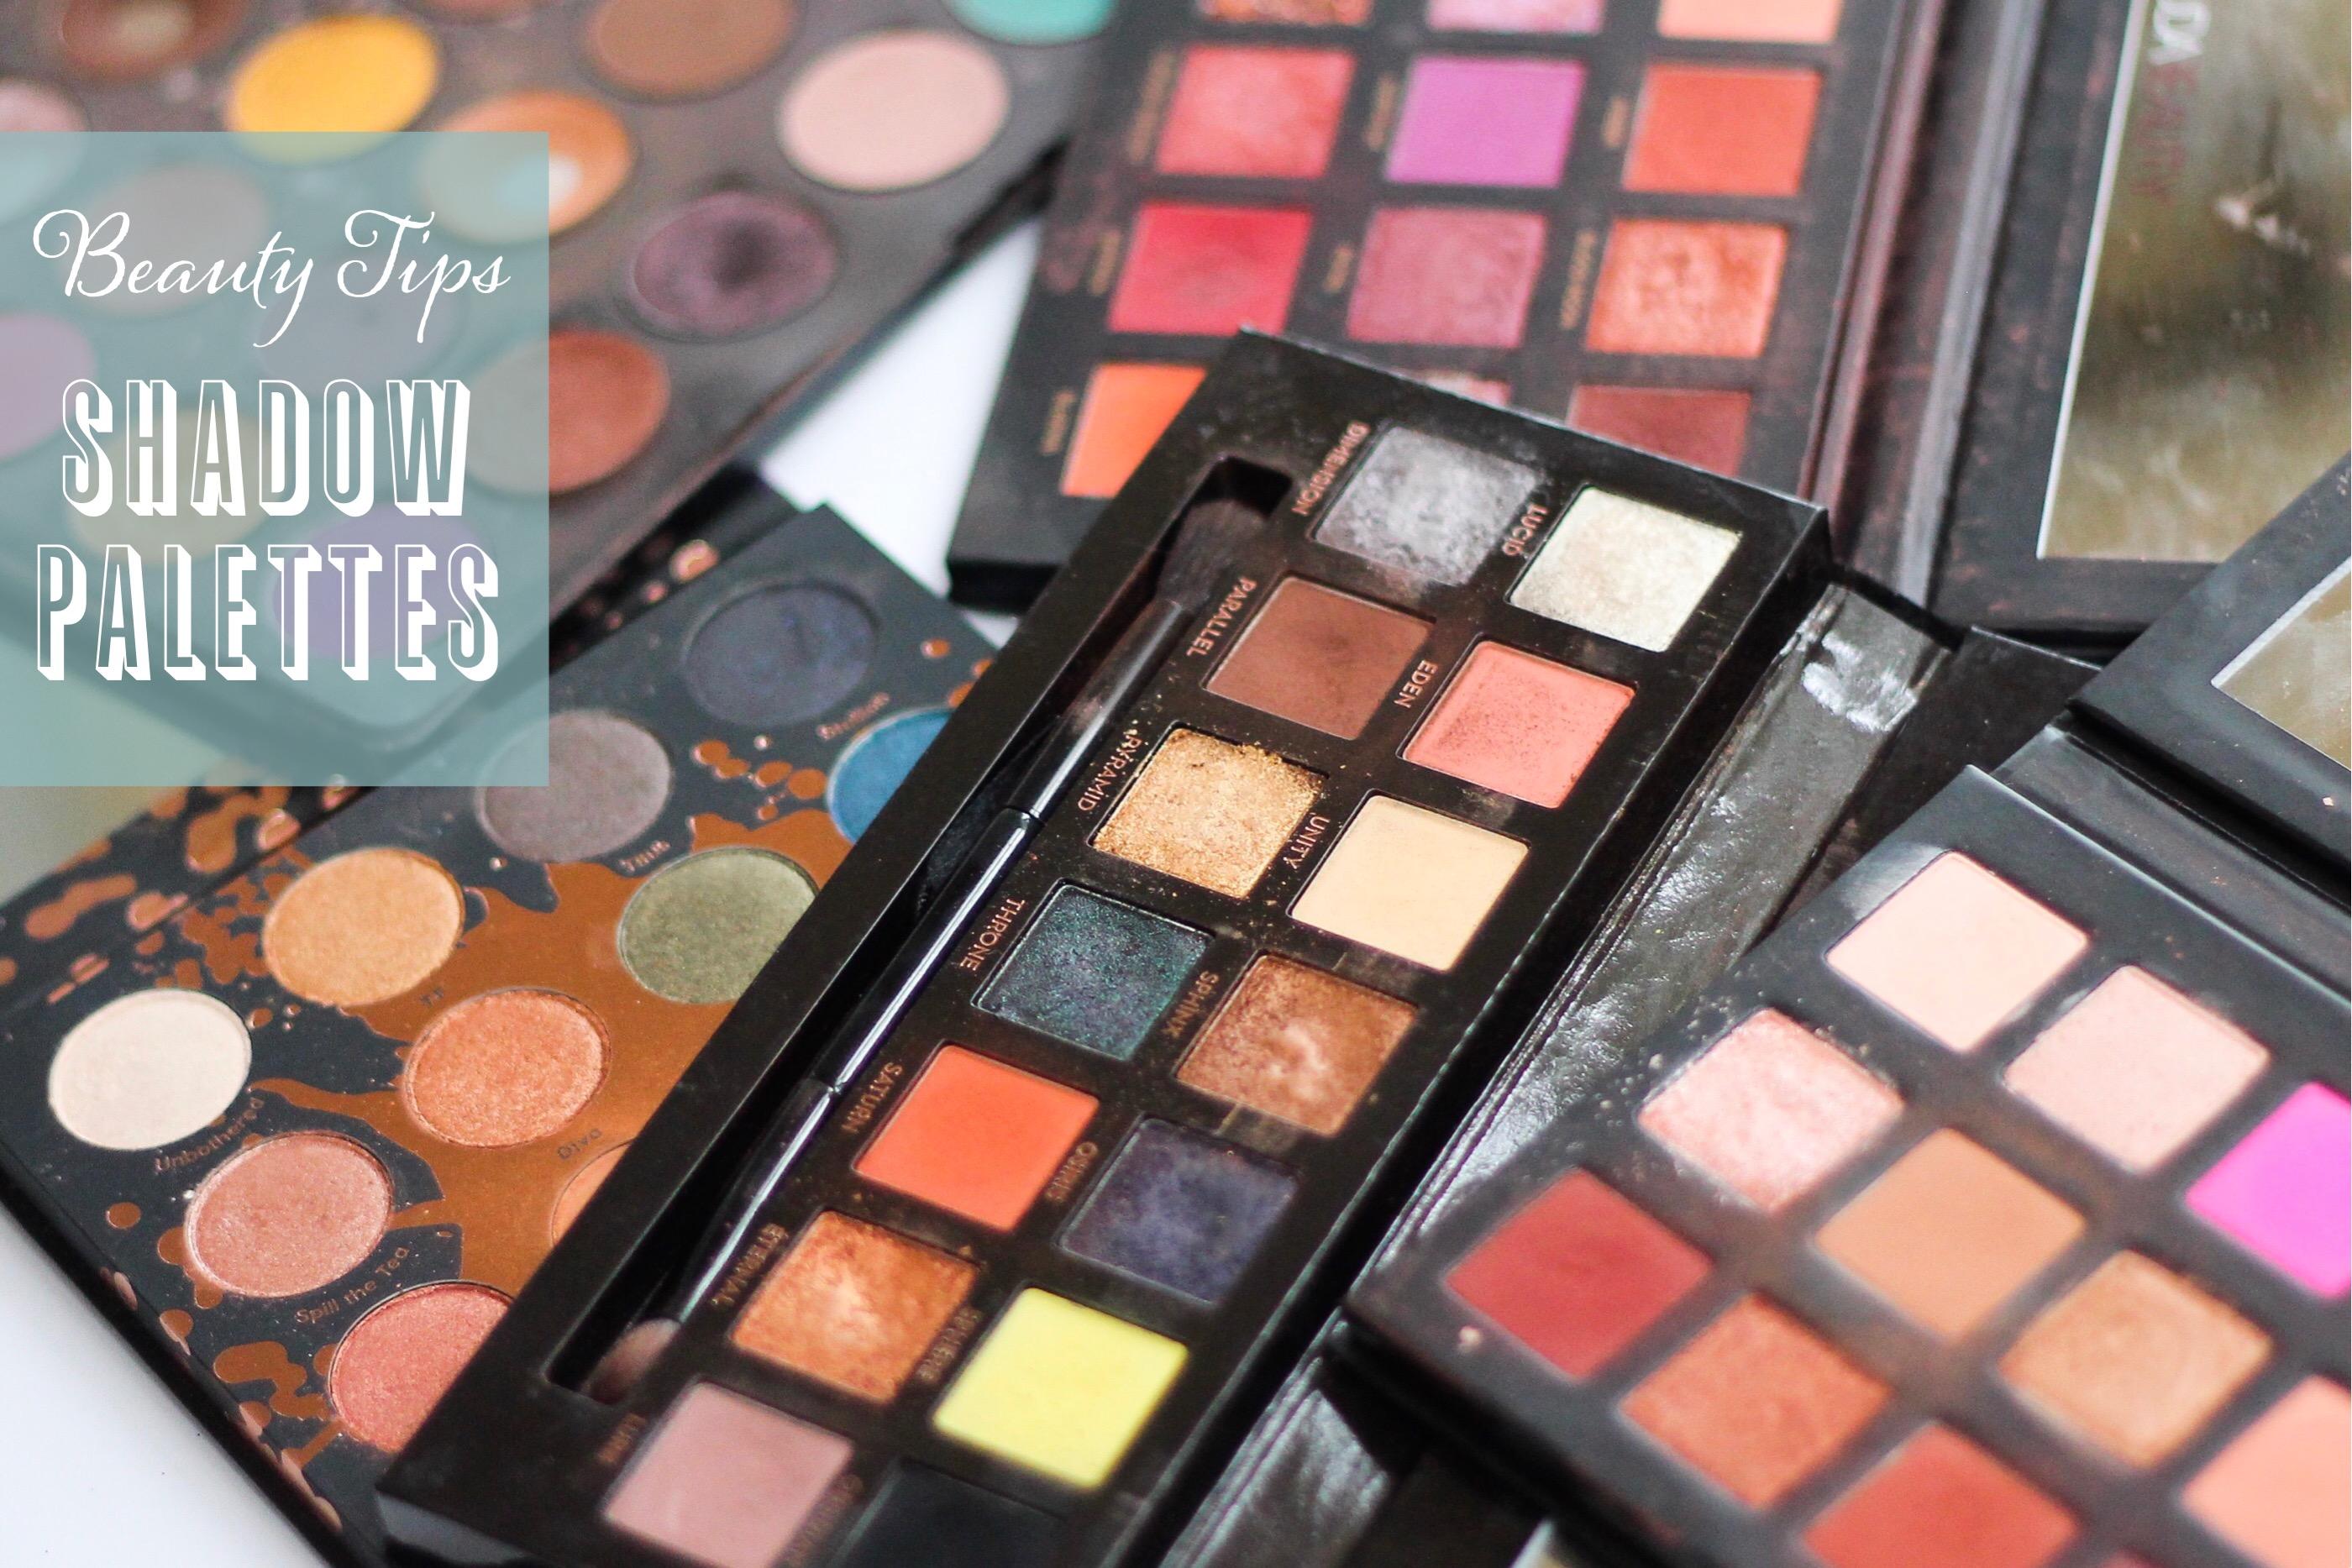 Anastasia Beverly Hills Prism Eyeshadow Palette, colourpop perception makeup Shayla, kylie cosmetics sipping pretty, huda beauty desert dusk, Sephora review, BeautyTips: How to choose a good eyeshadow palette, dark skin beauty plus blogger